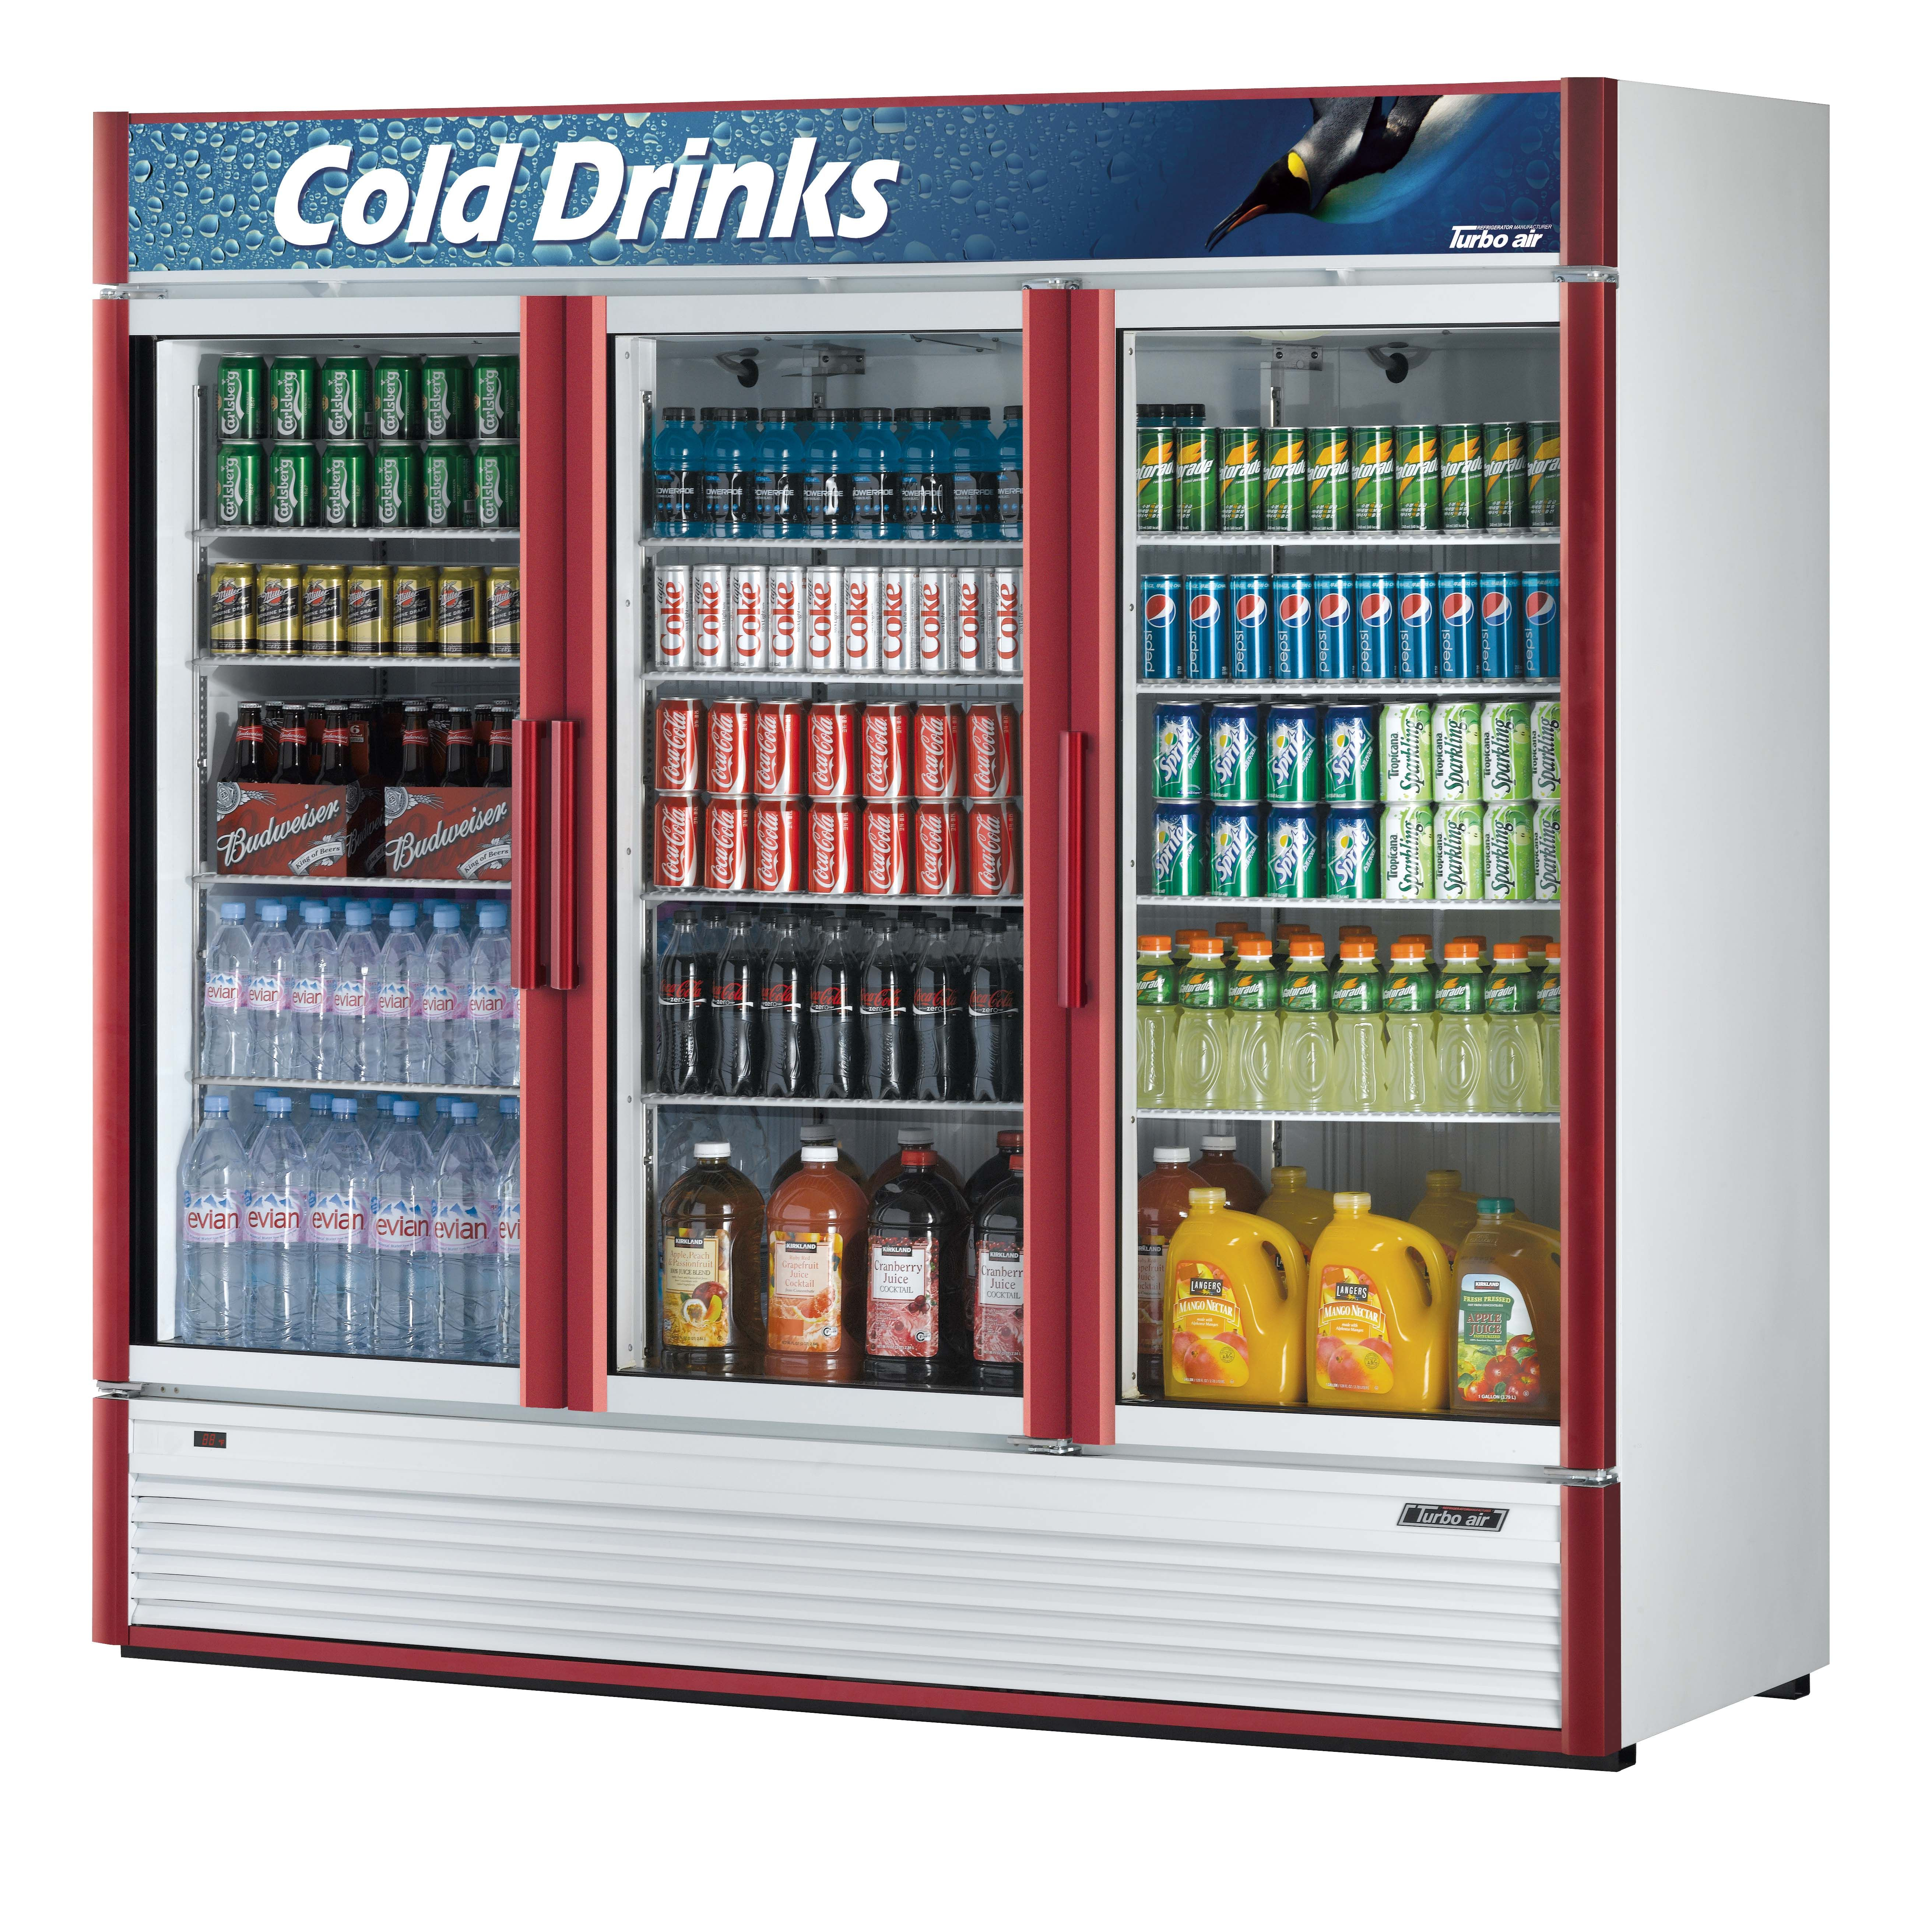 Refrigerator 71 3 Cu Ft 3 Swing Doors Refrigerador 71 3 Pies